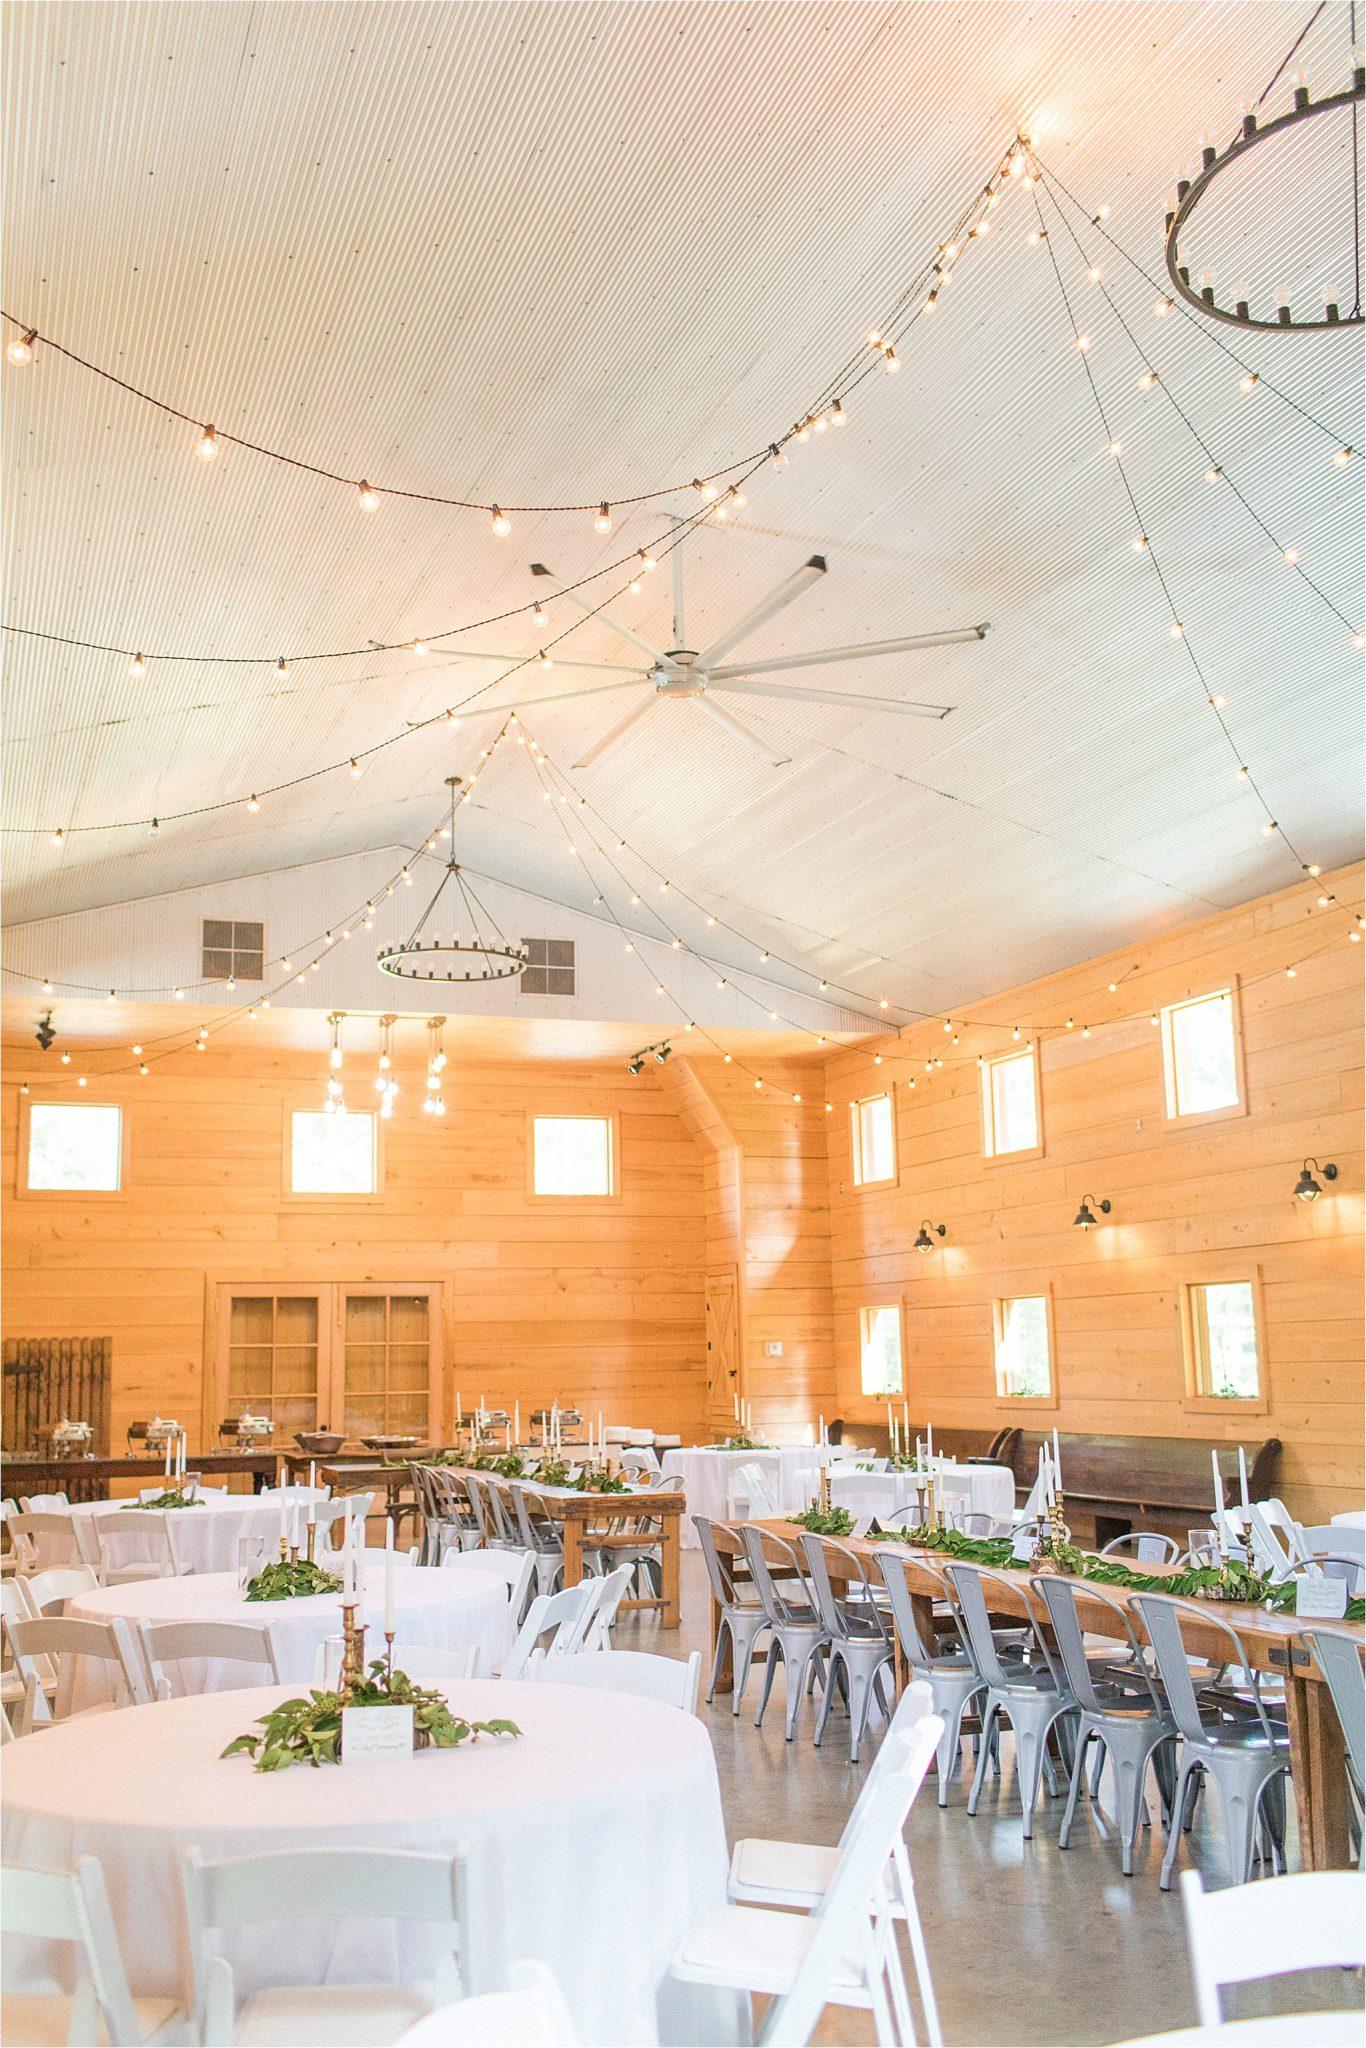 wedding-reception-alabama-venue-barn-farm-tables-metal-chairs-candle-centerpieces